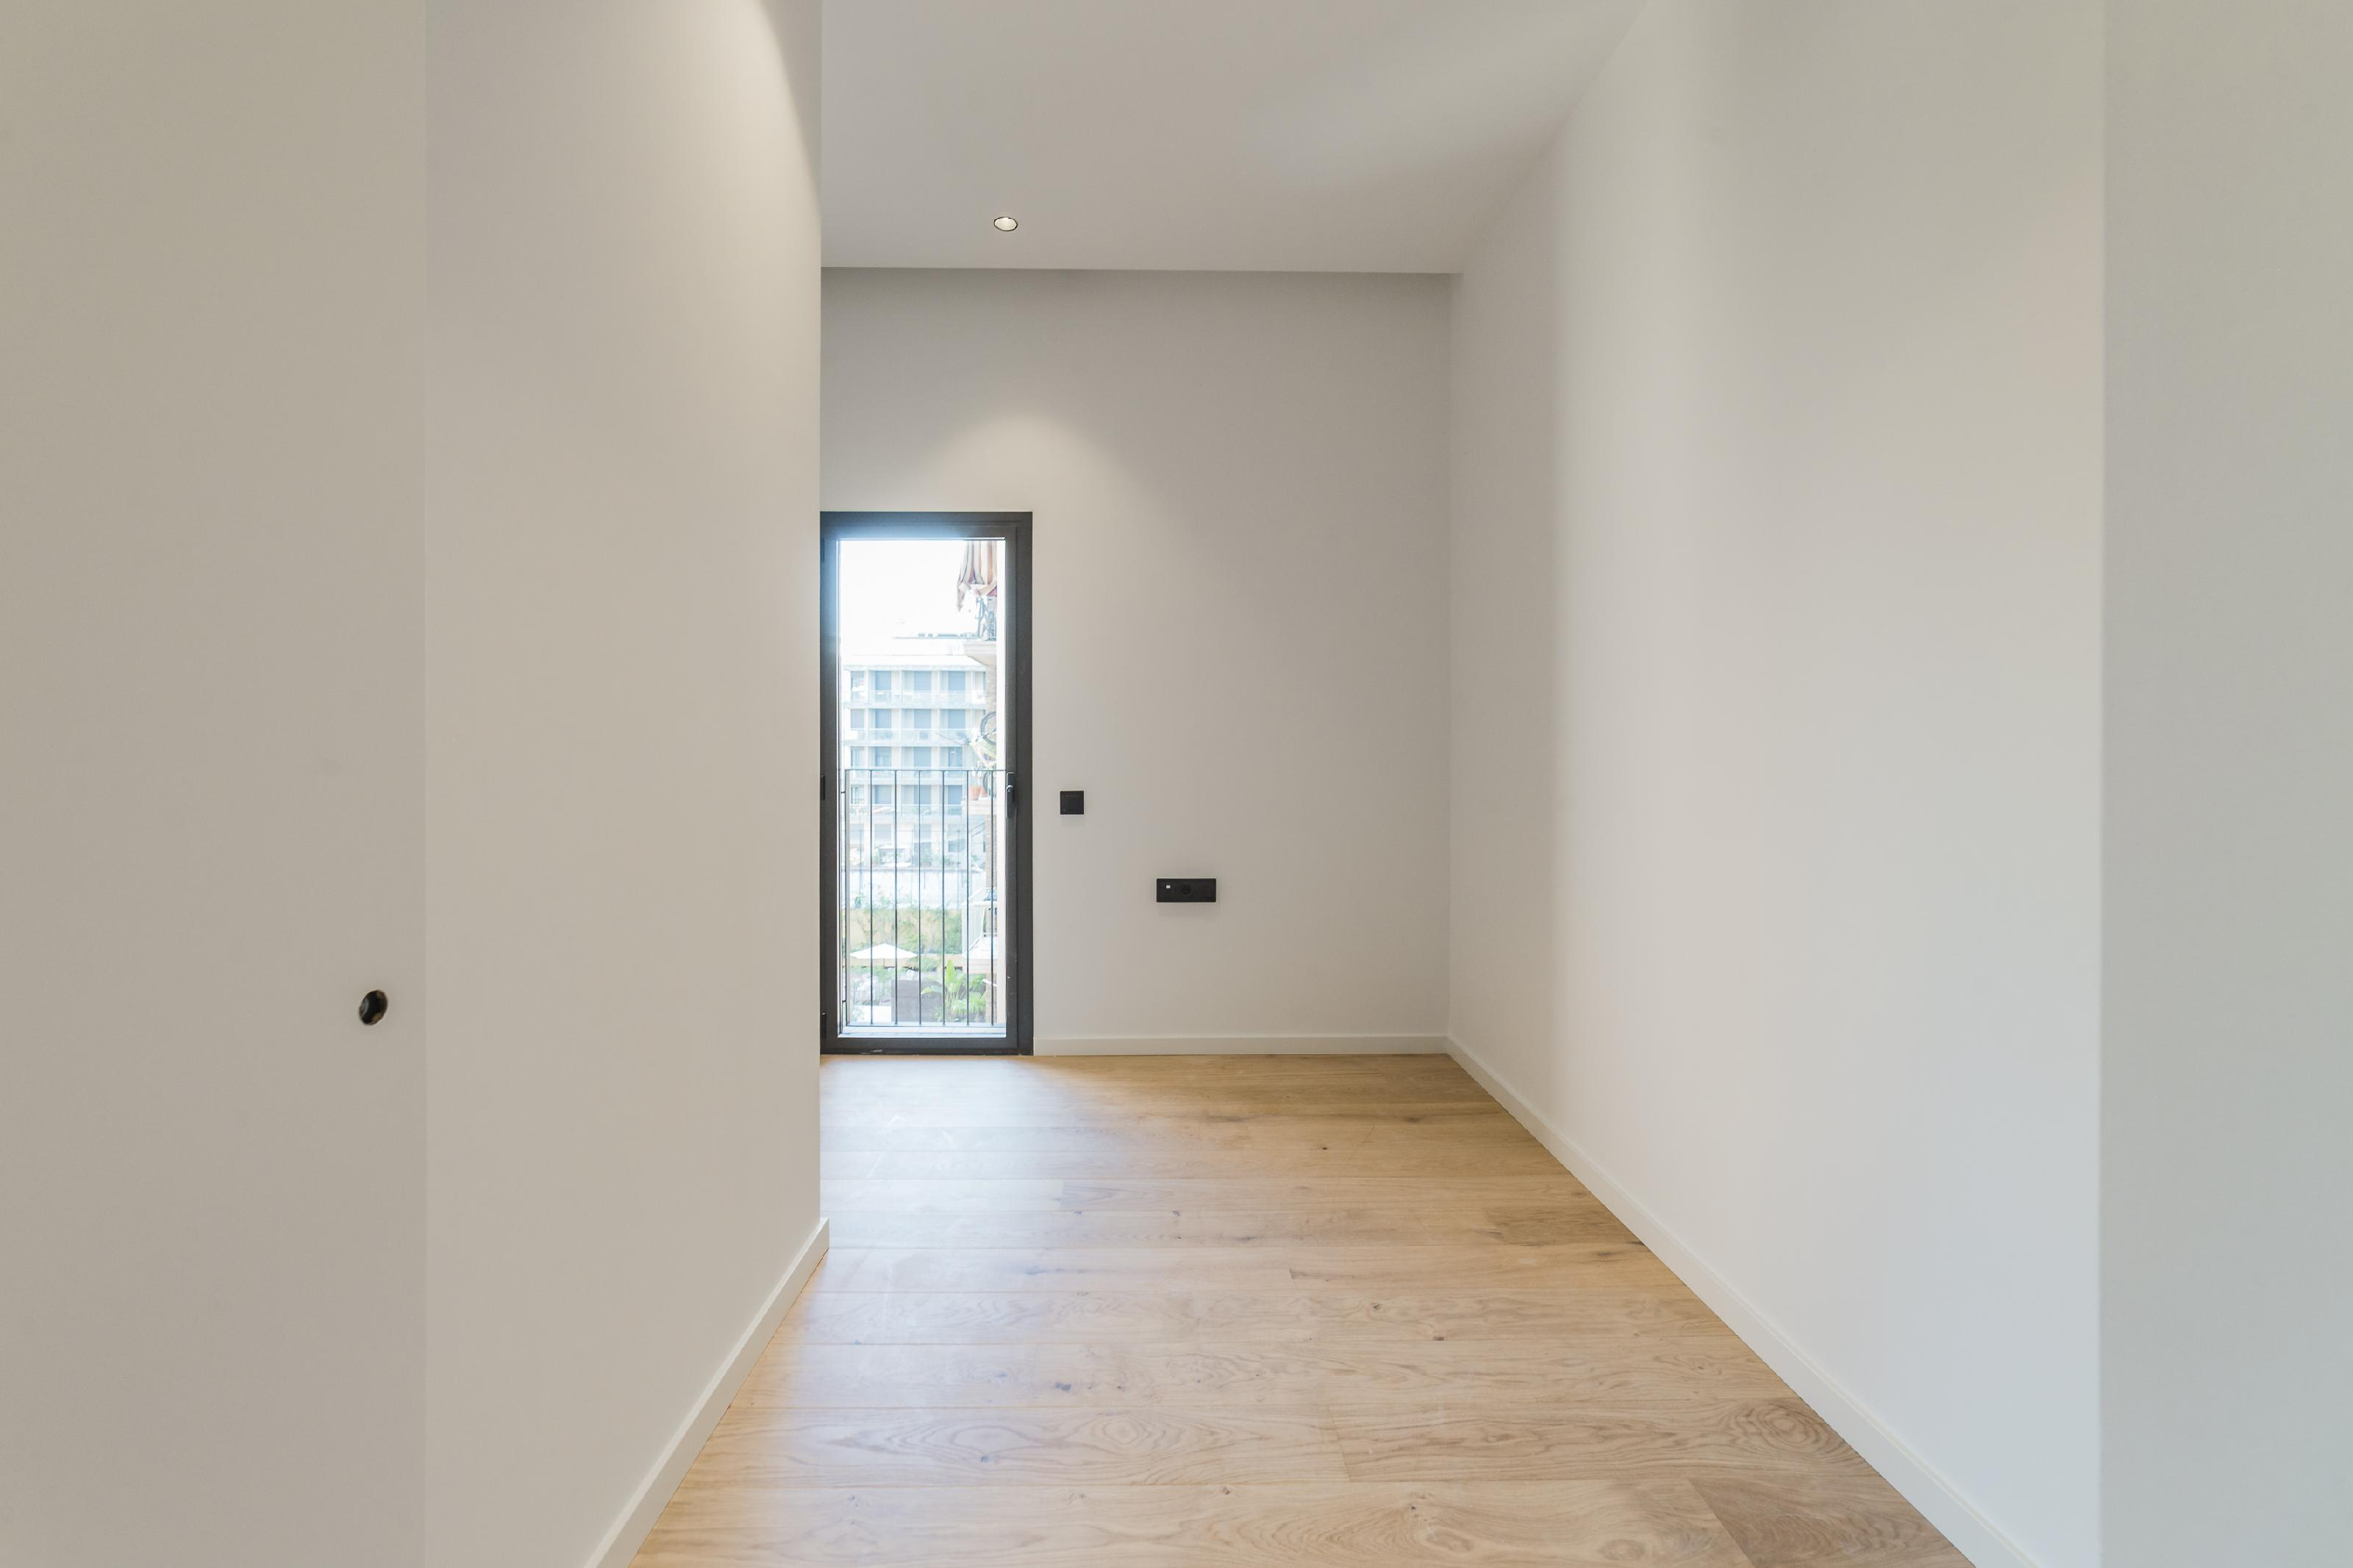 182456 Apartamento en venda en Eixample, Antiga Esquerre Eixample 24